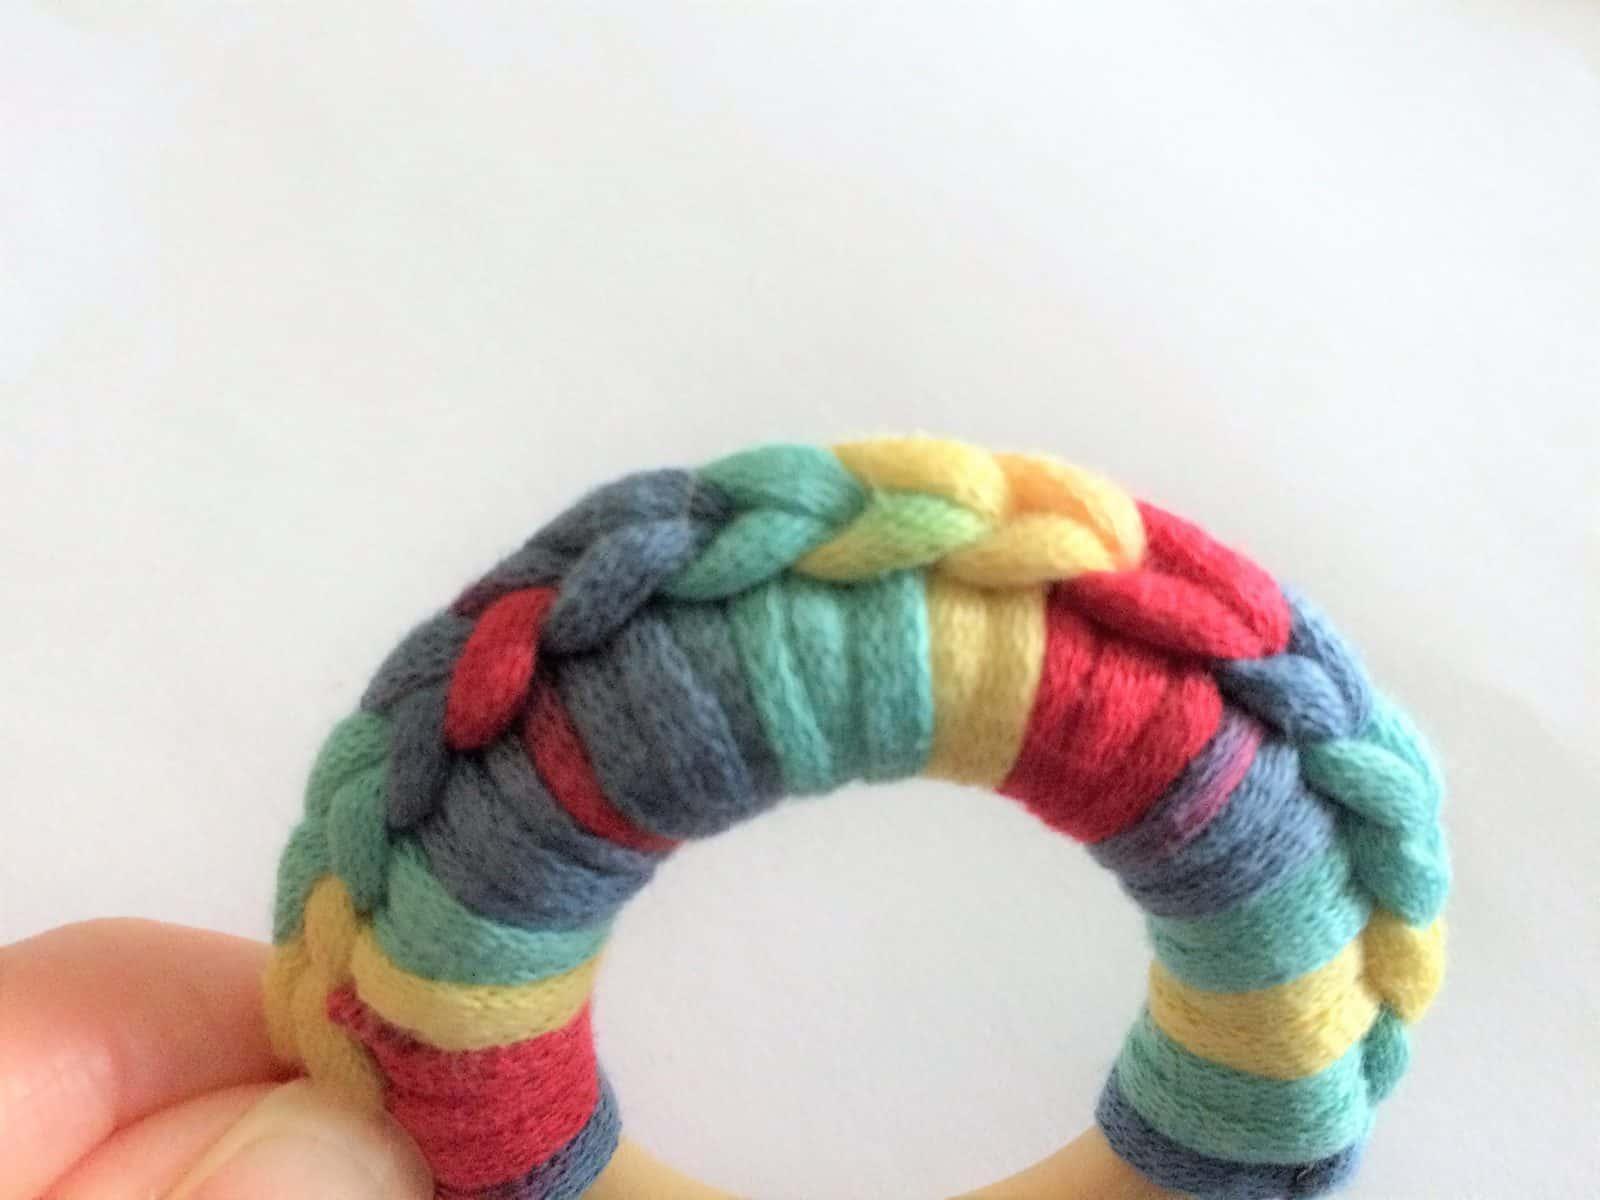 Wood Ring Teether Crochet Tutorial